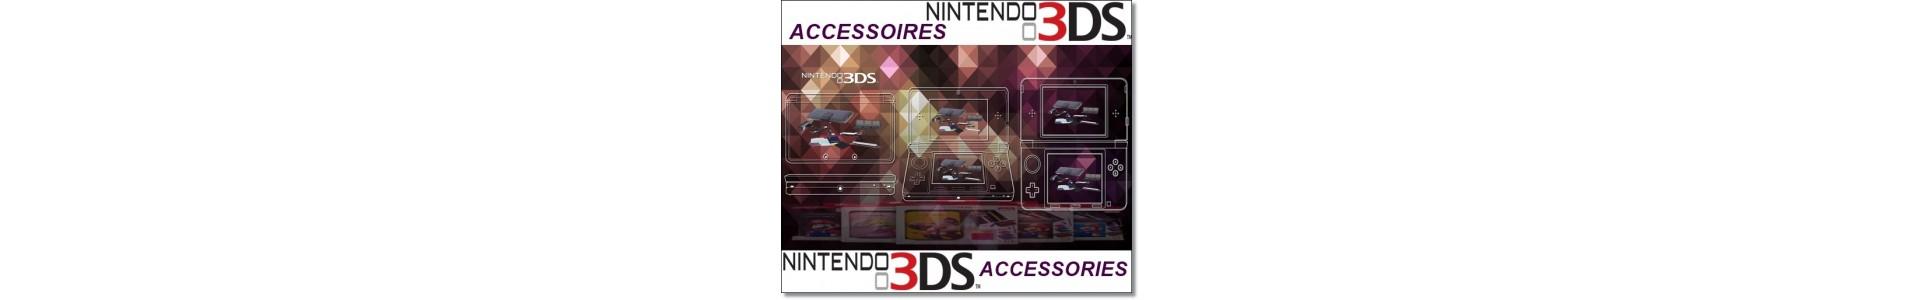 3ds accessories